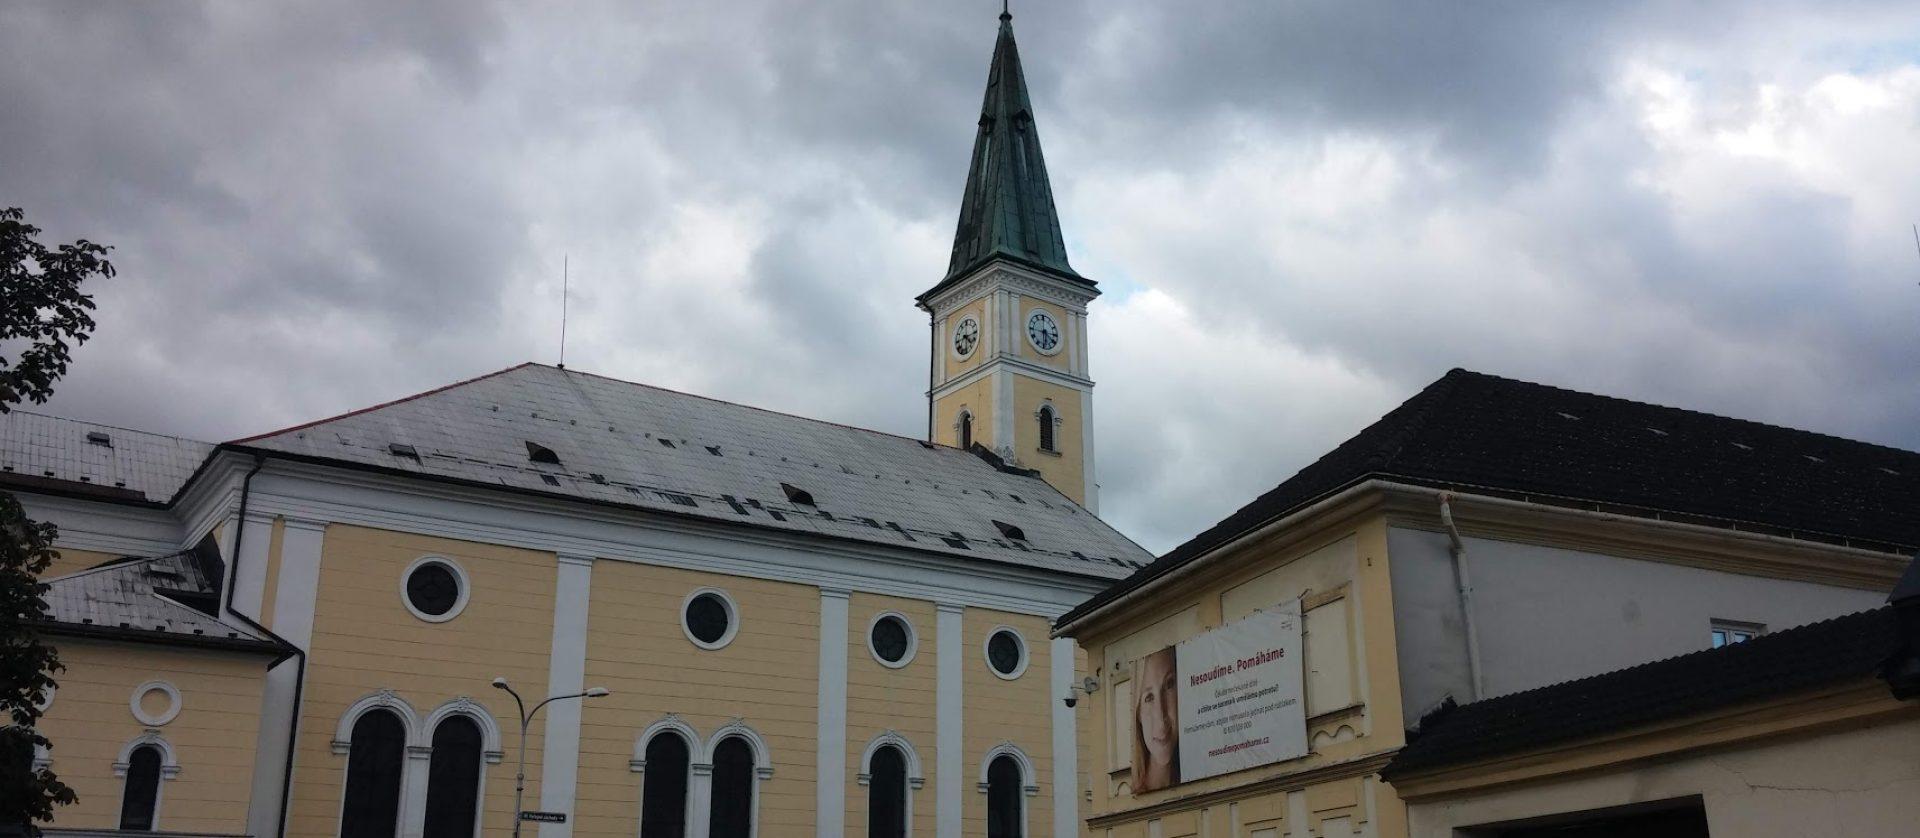 www.farnost-jesenik.cz